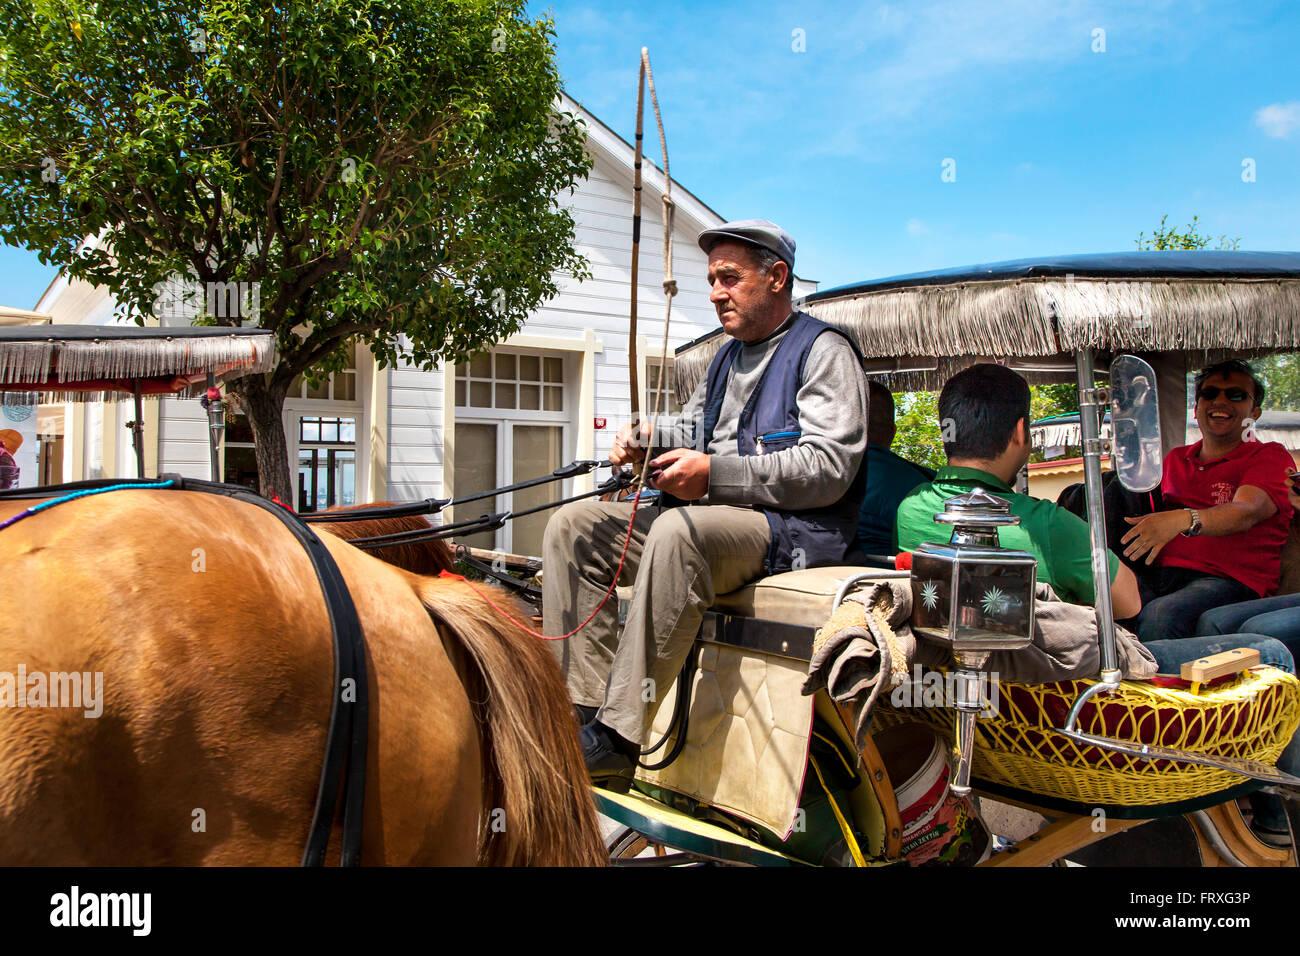 Horse drawn tourist carriage, Buyukada Island, Princess Islands, Marmara Sea, Istanbul, Turkey - Stock Image